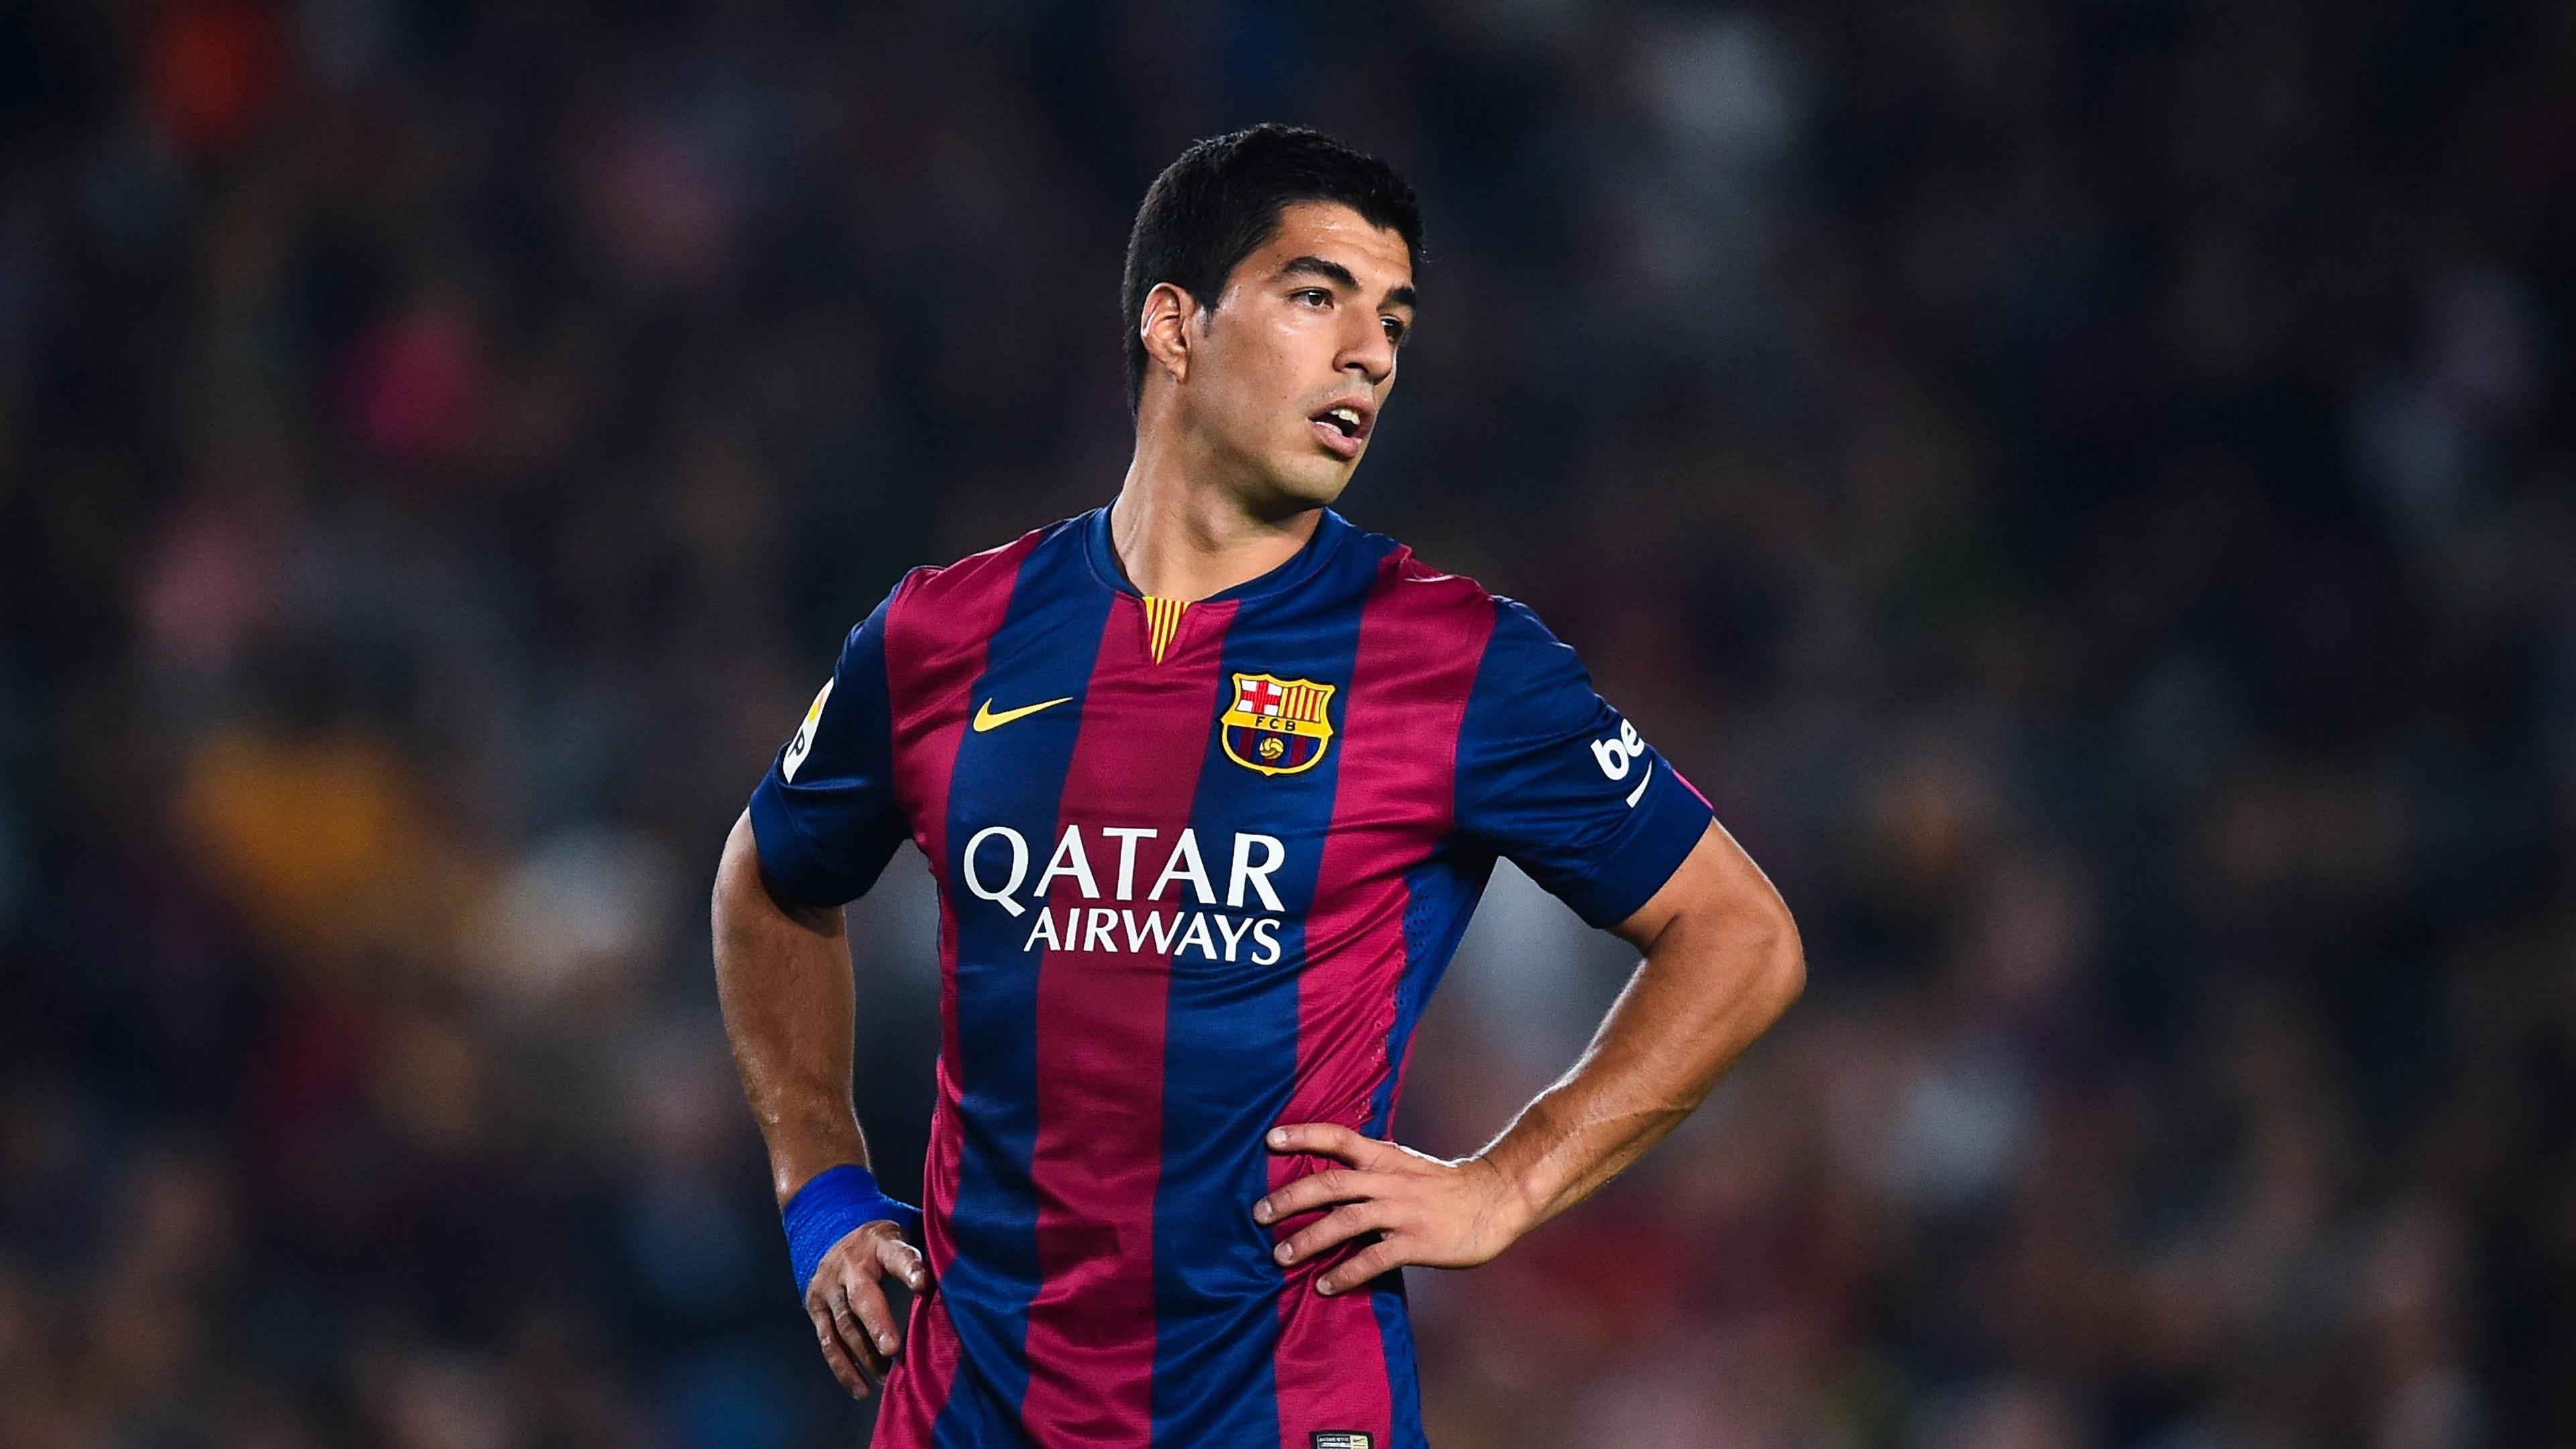 luis suarez striker barcelona soccer 4k 1540063501 - luis suarez, striker, barcelona, soccer 4k - striker, luis suarez, Barcelona